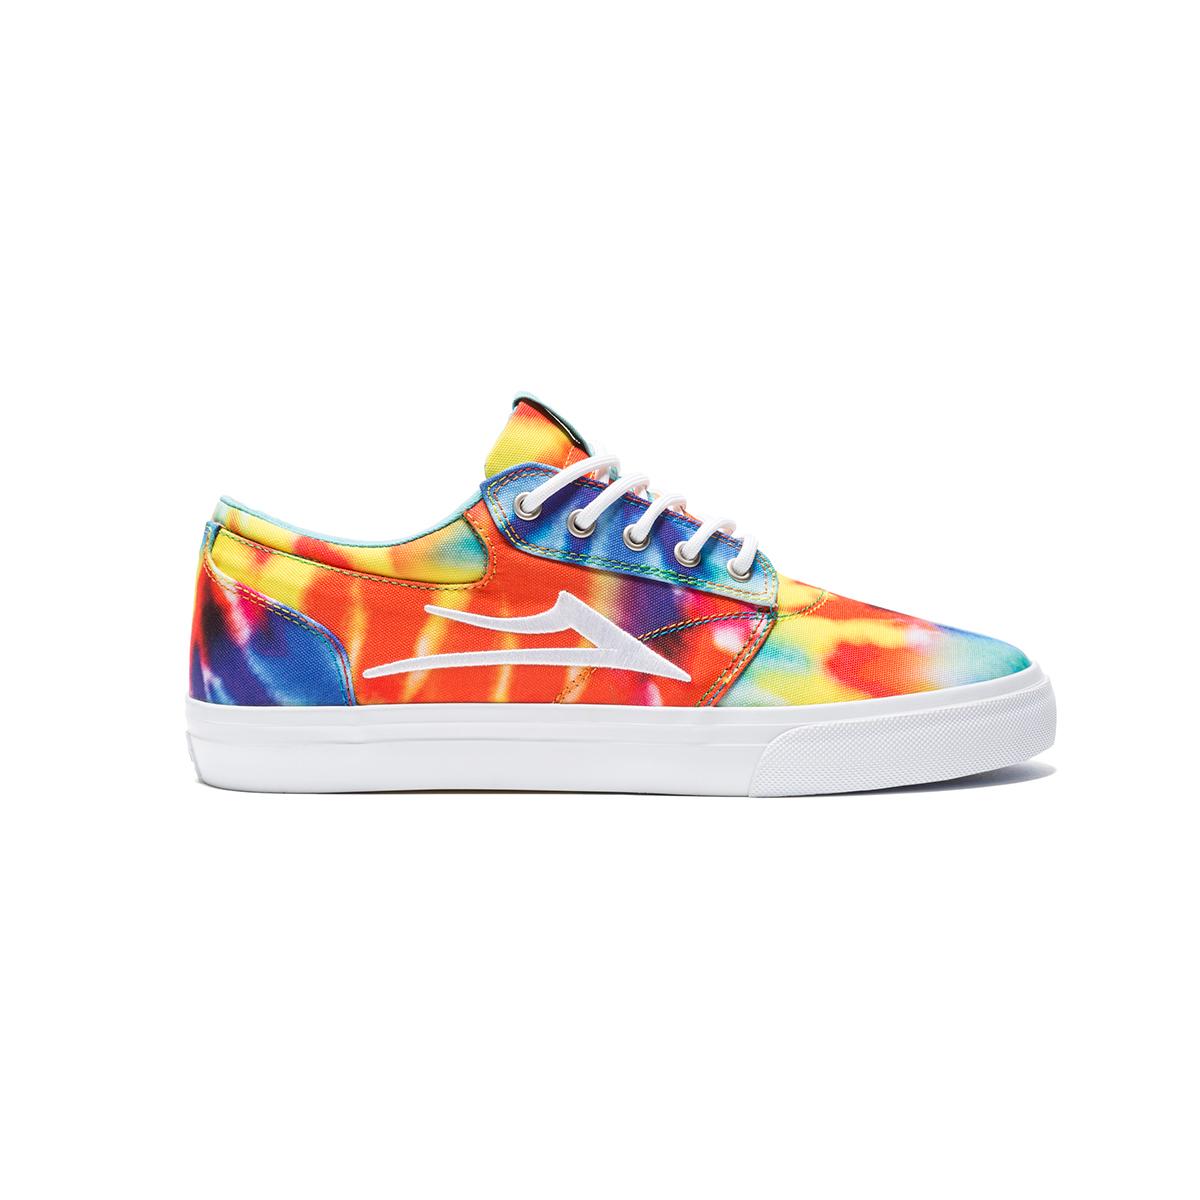 Lakai Skateboard Shoes Griffin Tie Dye